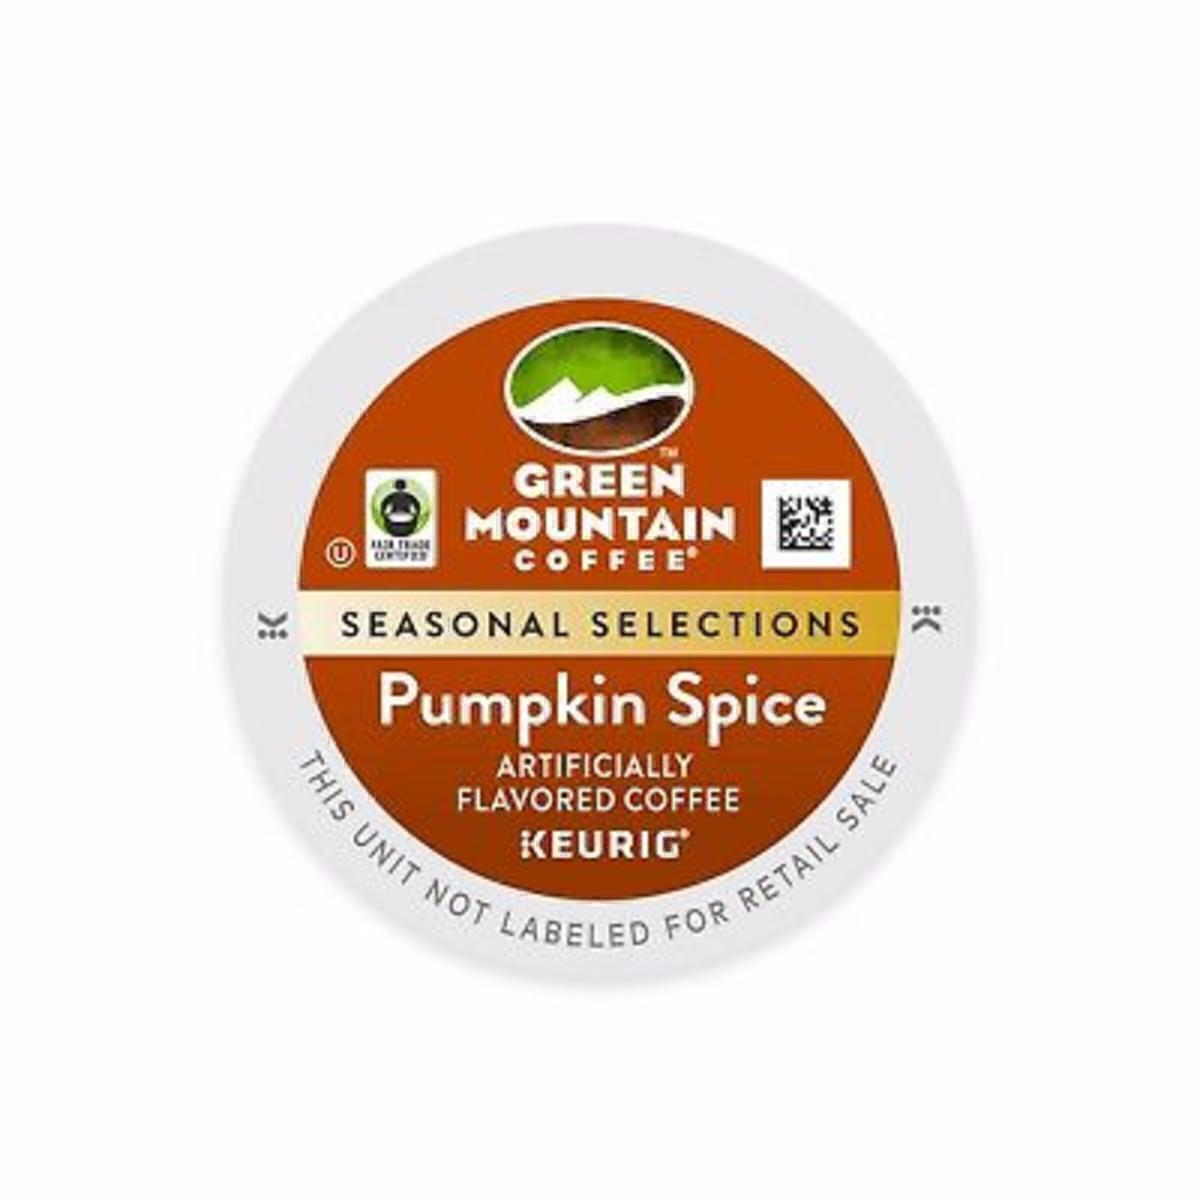 Pumpkin Spice Kcup